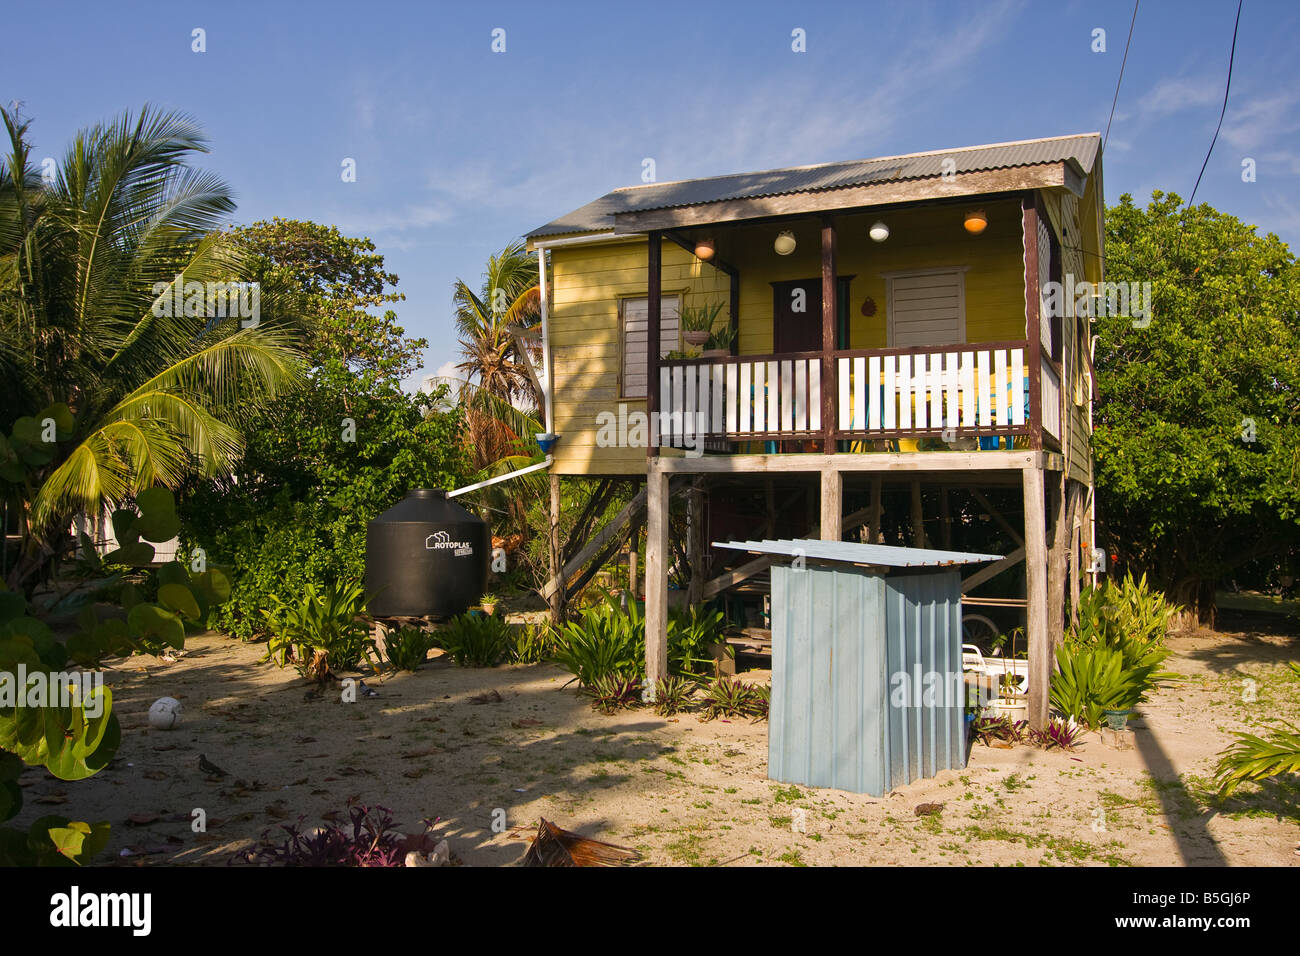 Caye Caulker Belize Small Wooden Cottage On Stilts With